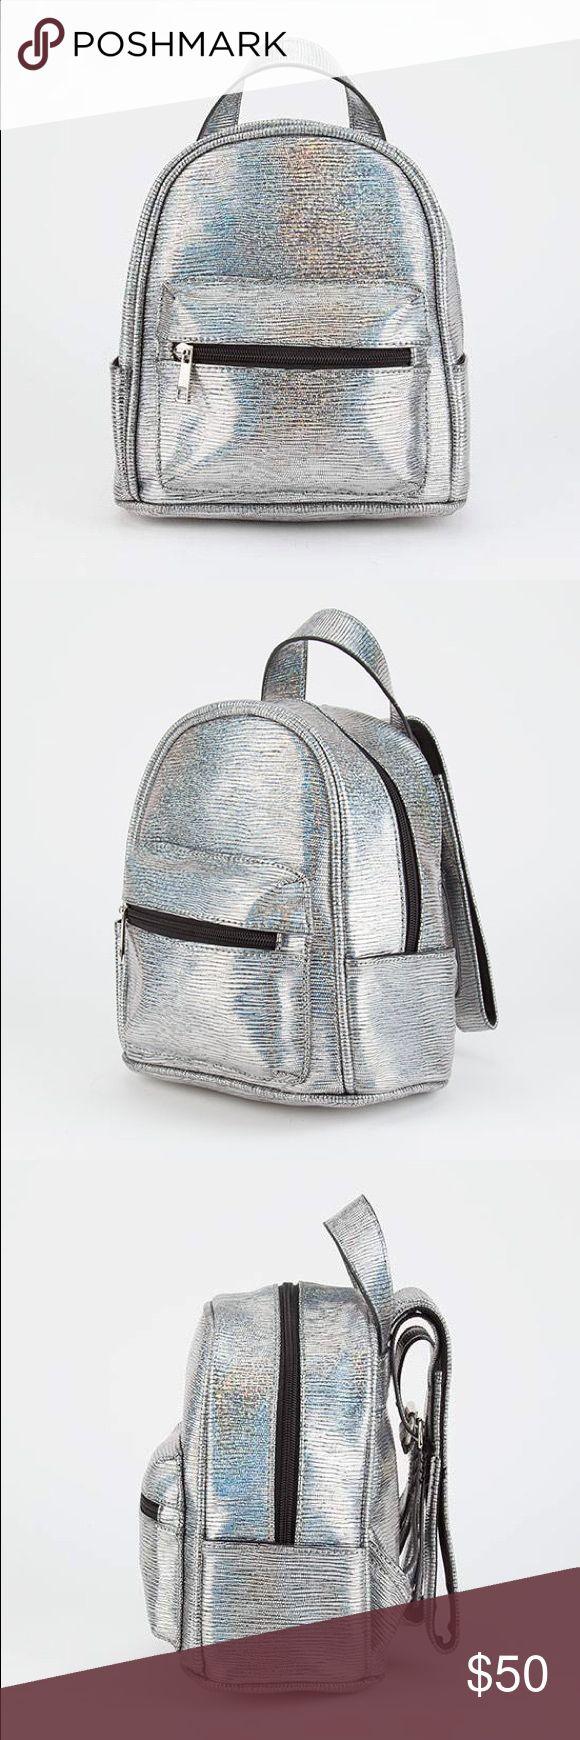 25 best ideas about kipling backpack on pinterest school handbags - Galaxy Mini Metallic Backpack Boutique